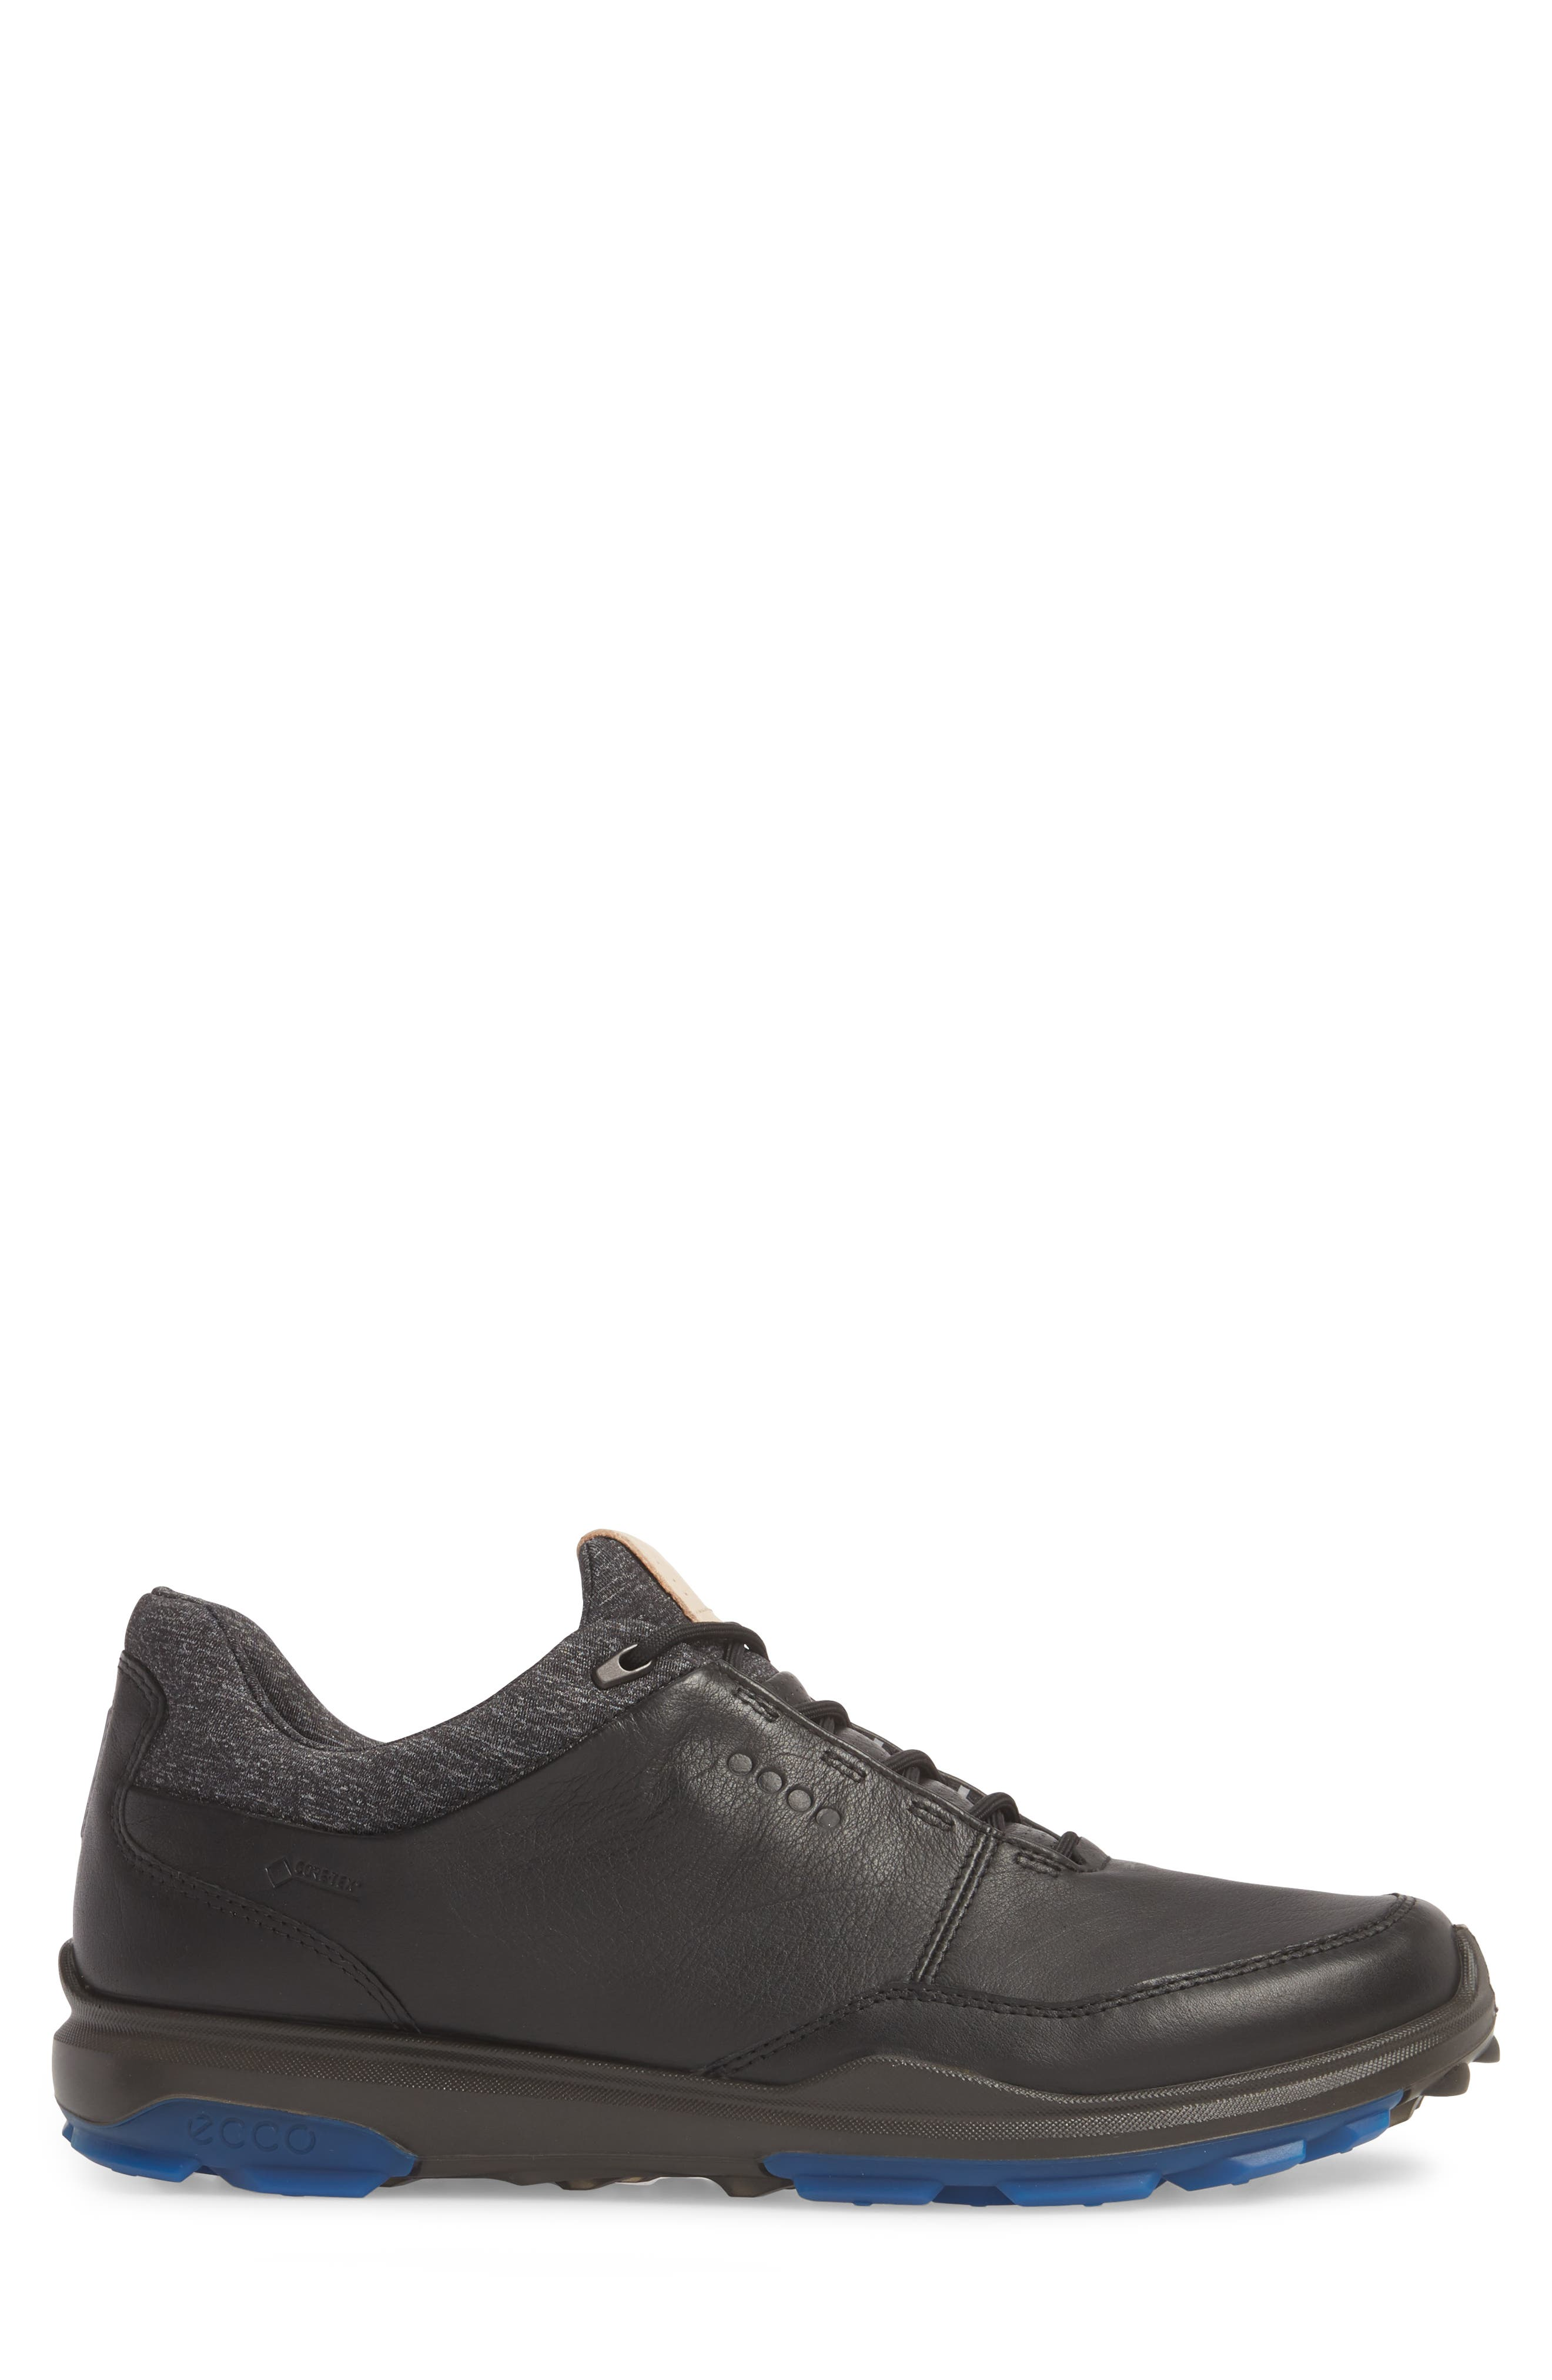 BIOM Hybrid 3 Gore-Tex<sup>®</sup> Golf Shoe,                             Alternate thumbnail 3, color,                             Black/ Bermuda Blue Leather